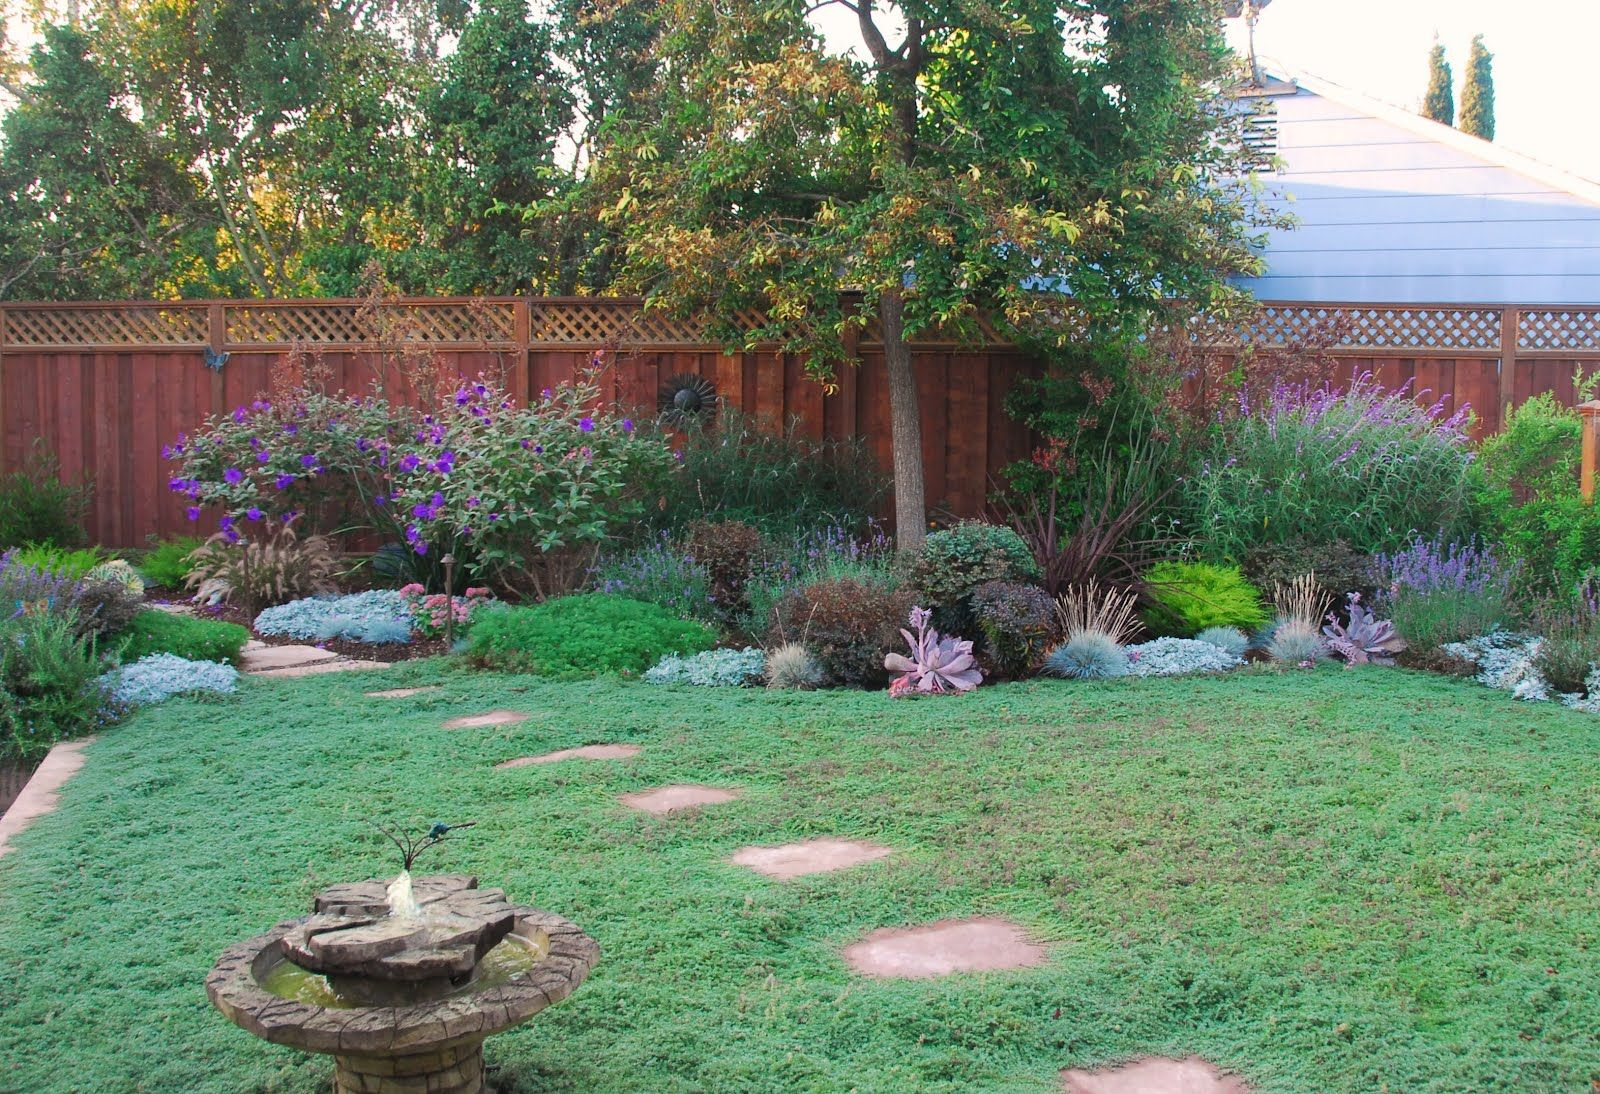 Astrid Gaiser Garden Design: Lilac Lawns U2013 Or Why Water Wise Rocks